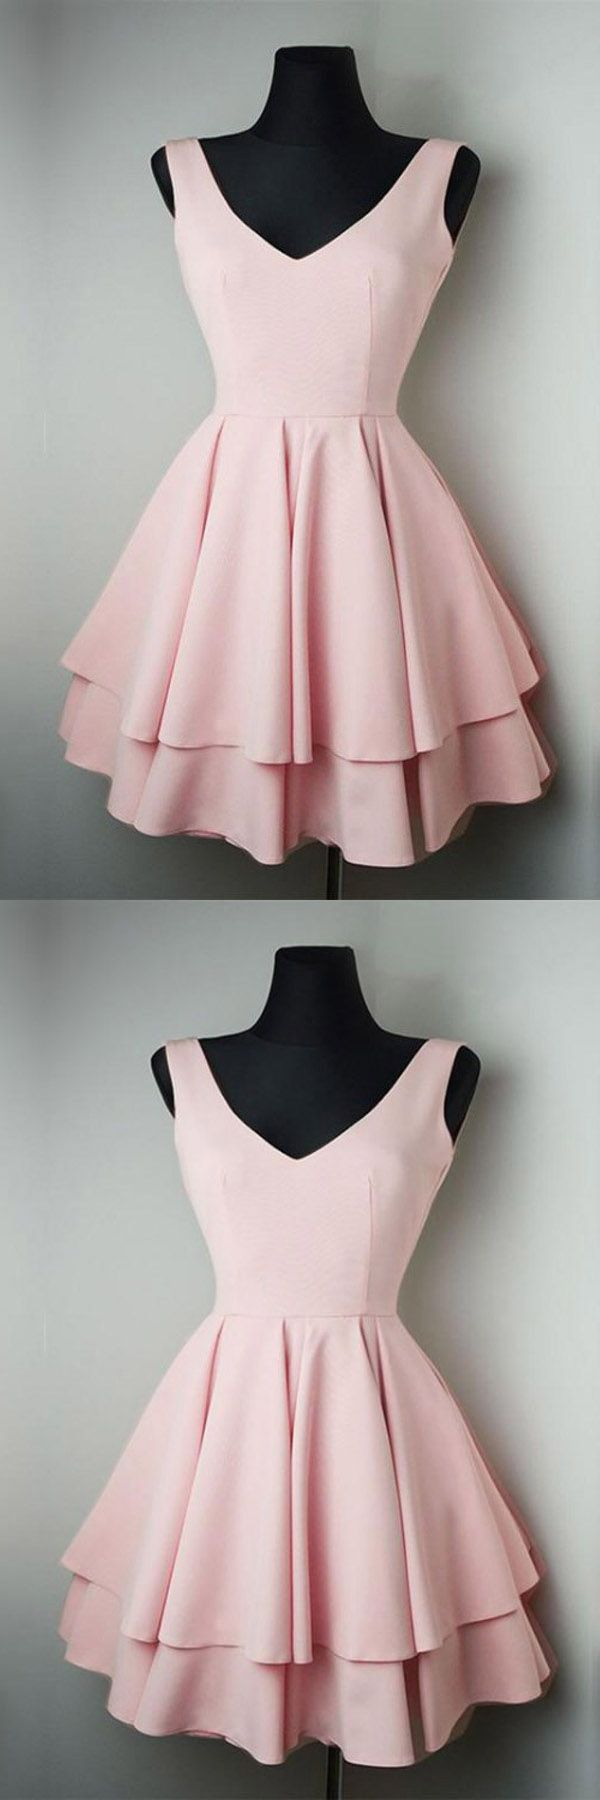 Simple v neck satin pretty homecoming dresses short prom dresses